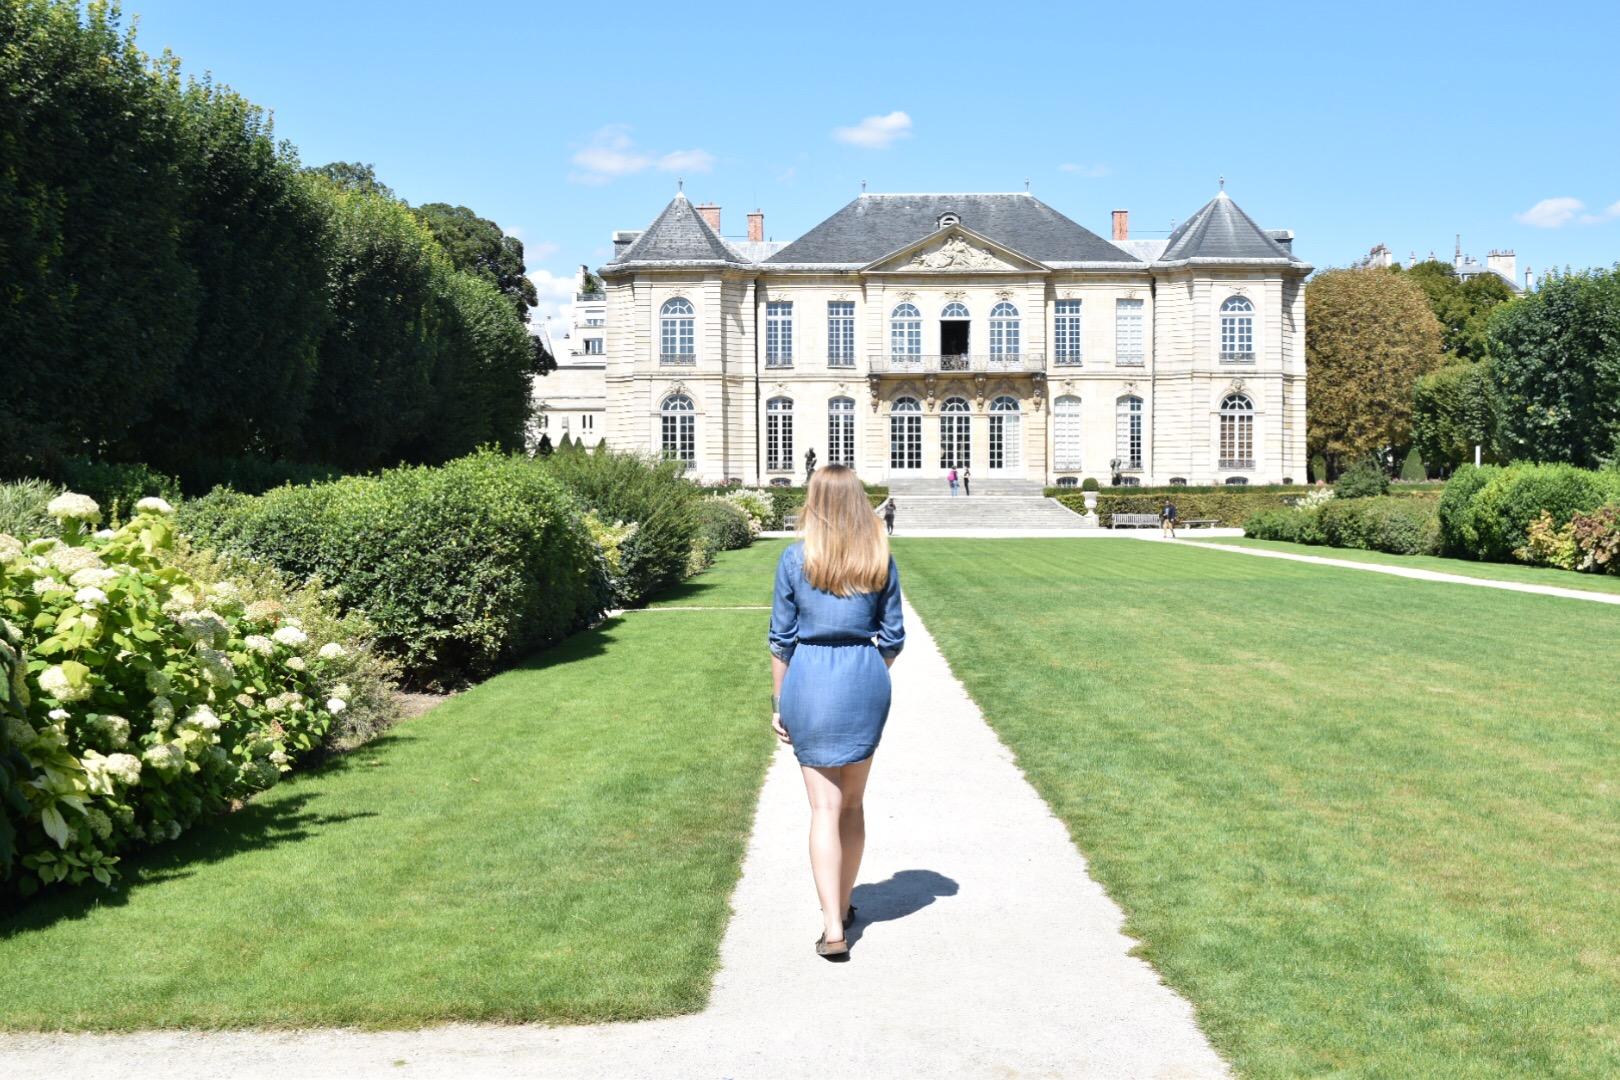 Day 6: Musee Rodin